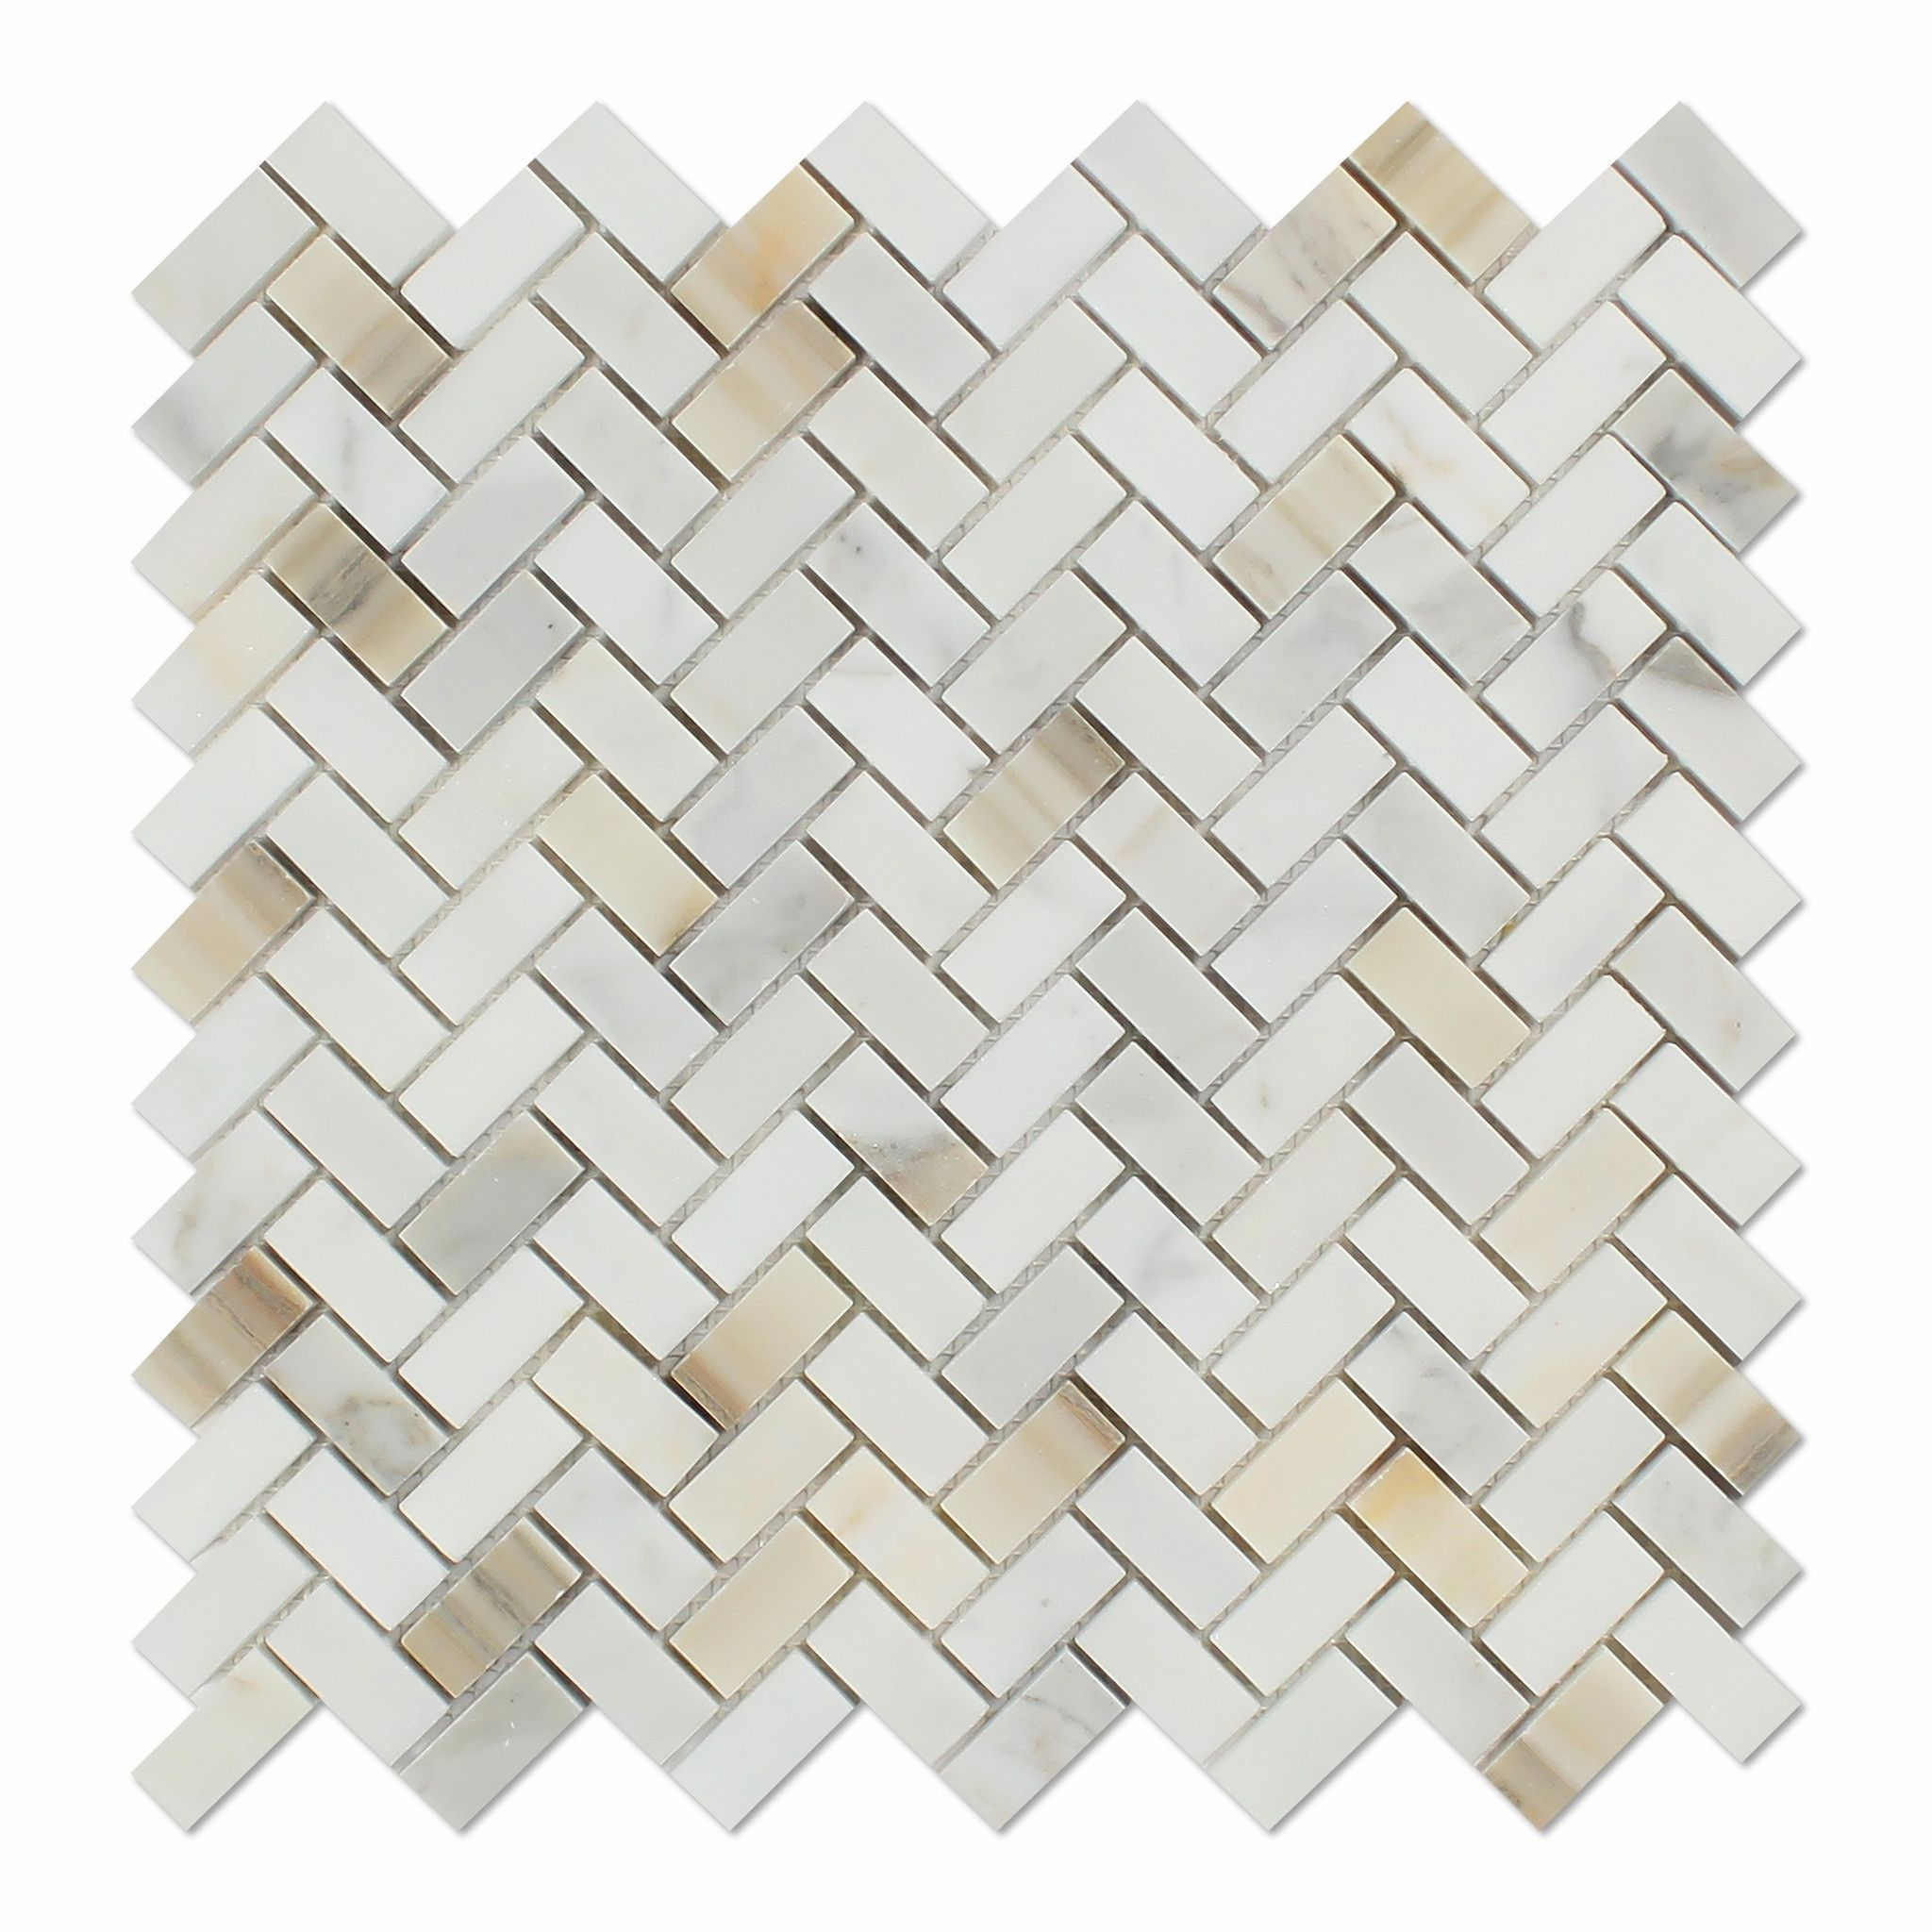 calacatta gold marble polished mini herringbone mosaic. Black Bedroom Furniture Sets. Home Design Ideas